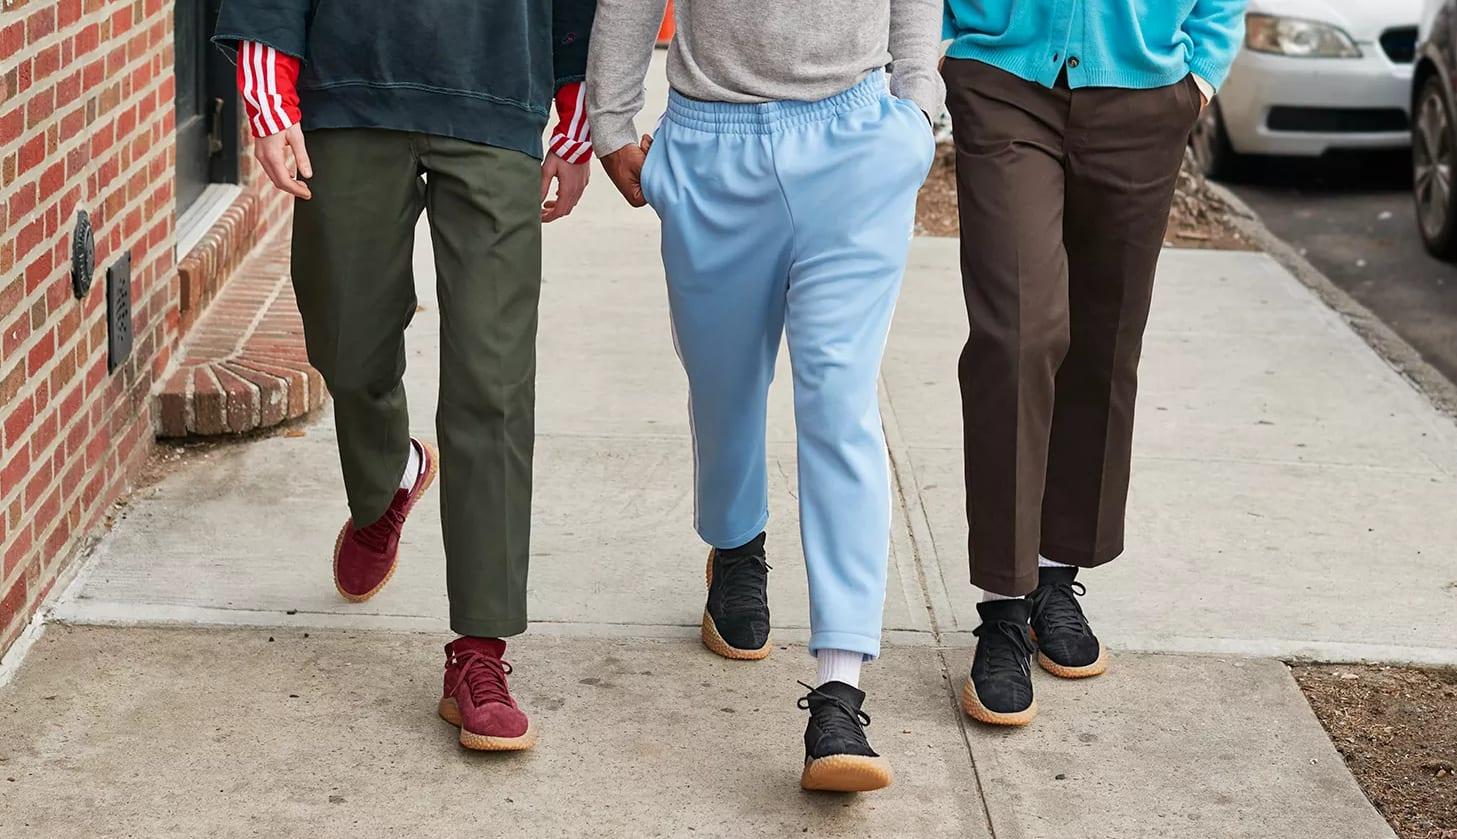 Adidas Kamanda 'Core Black/Gum' and 'Collegiate Burgundy/Gum' (On-Foot)